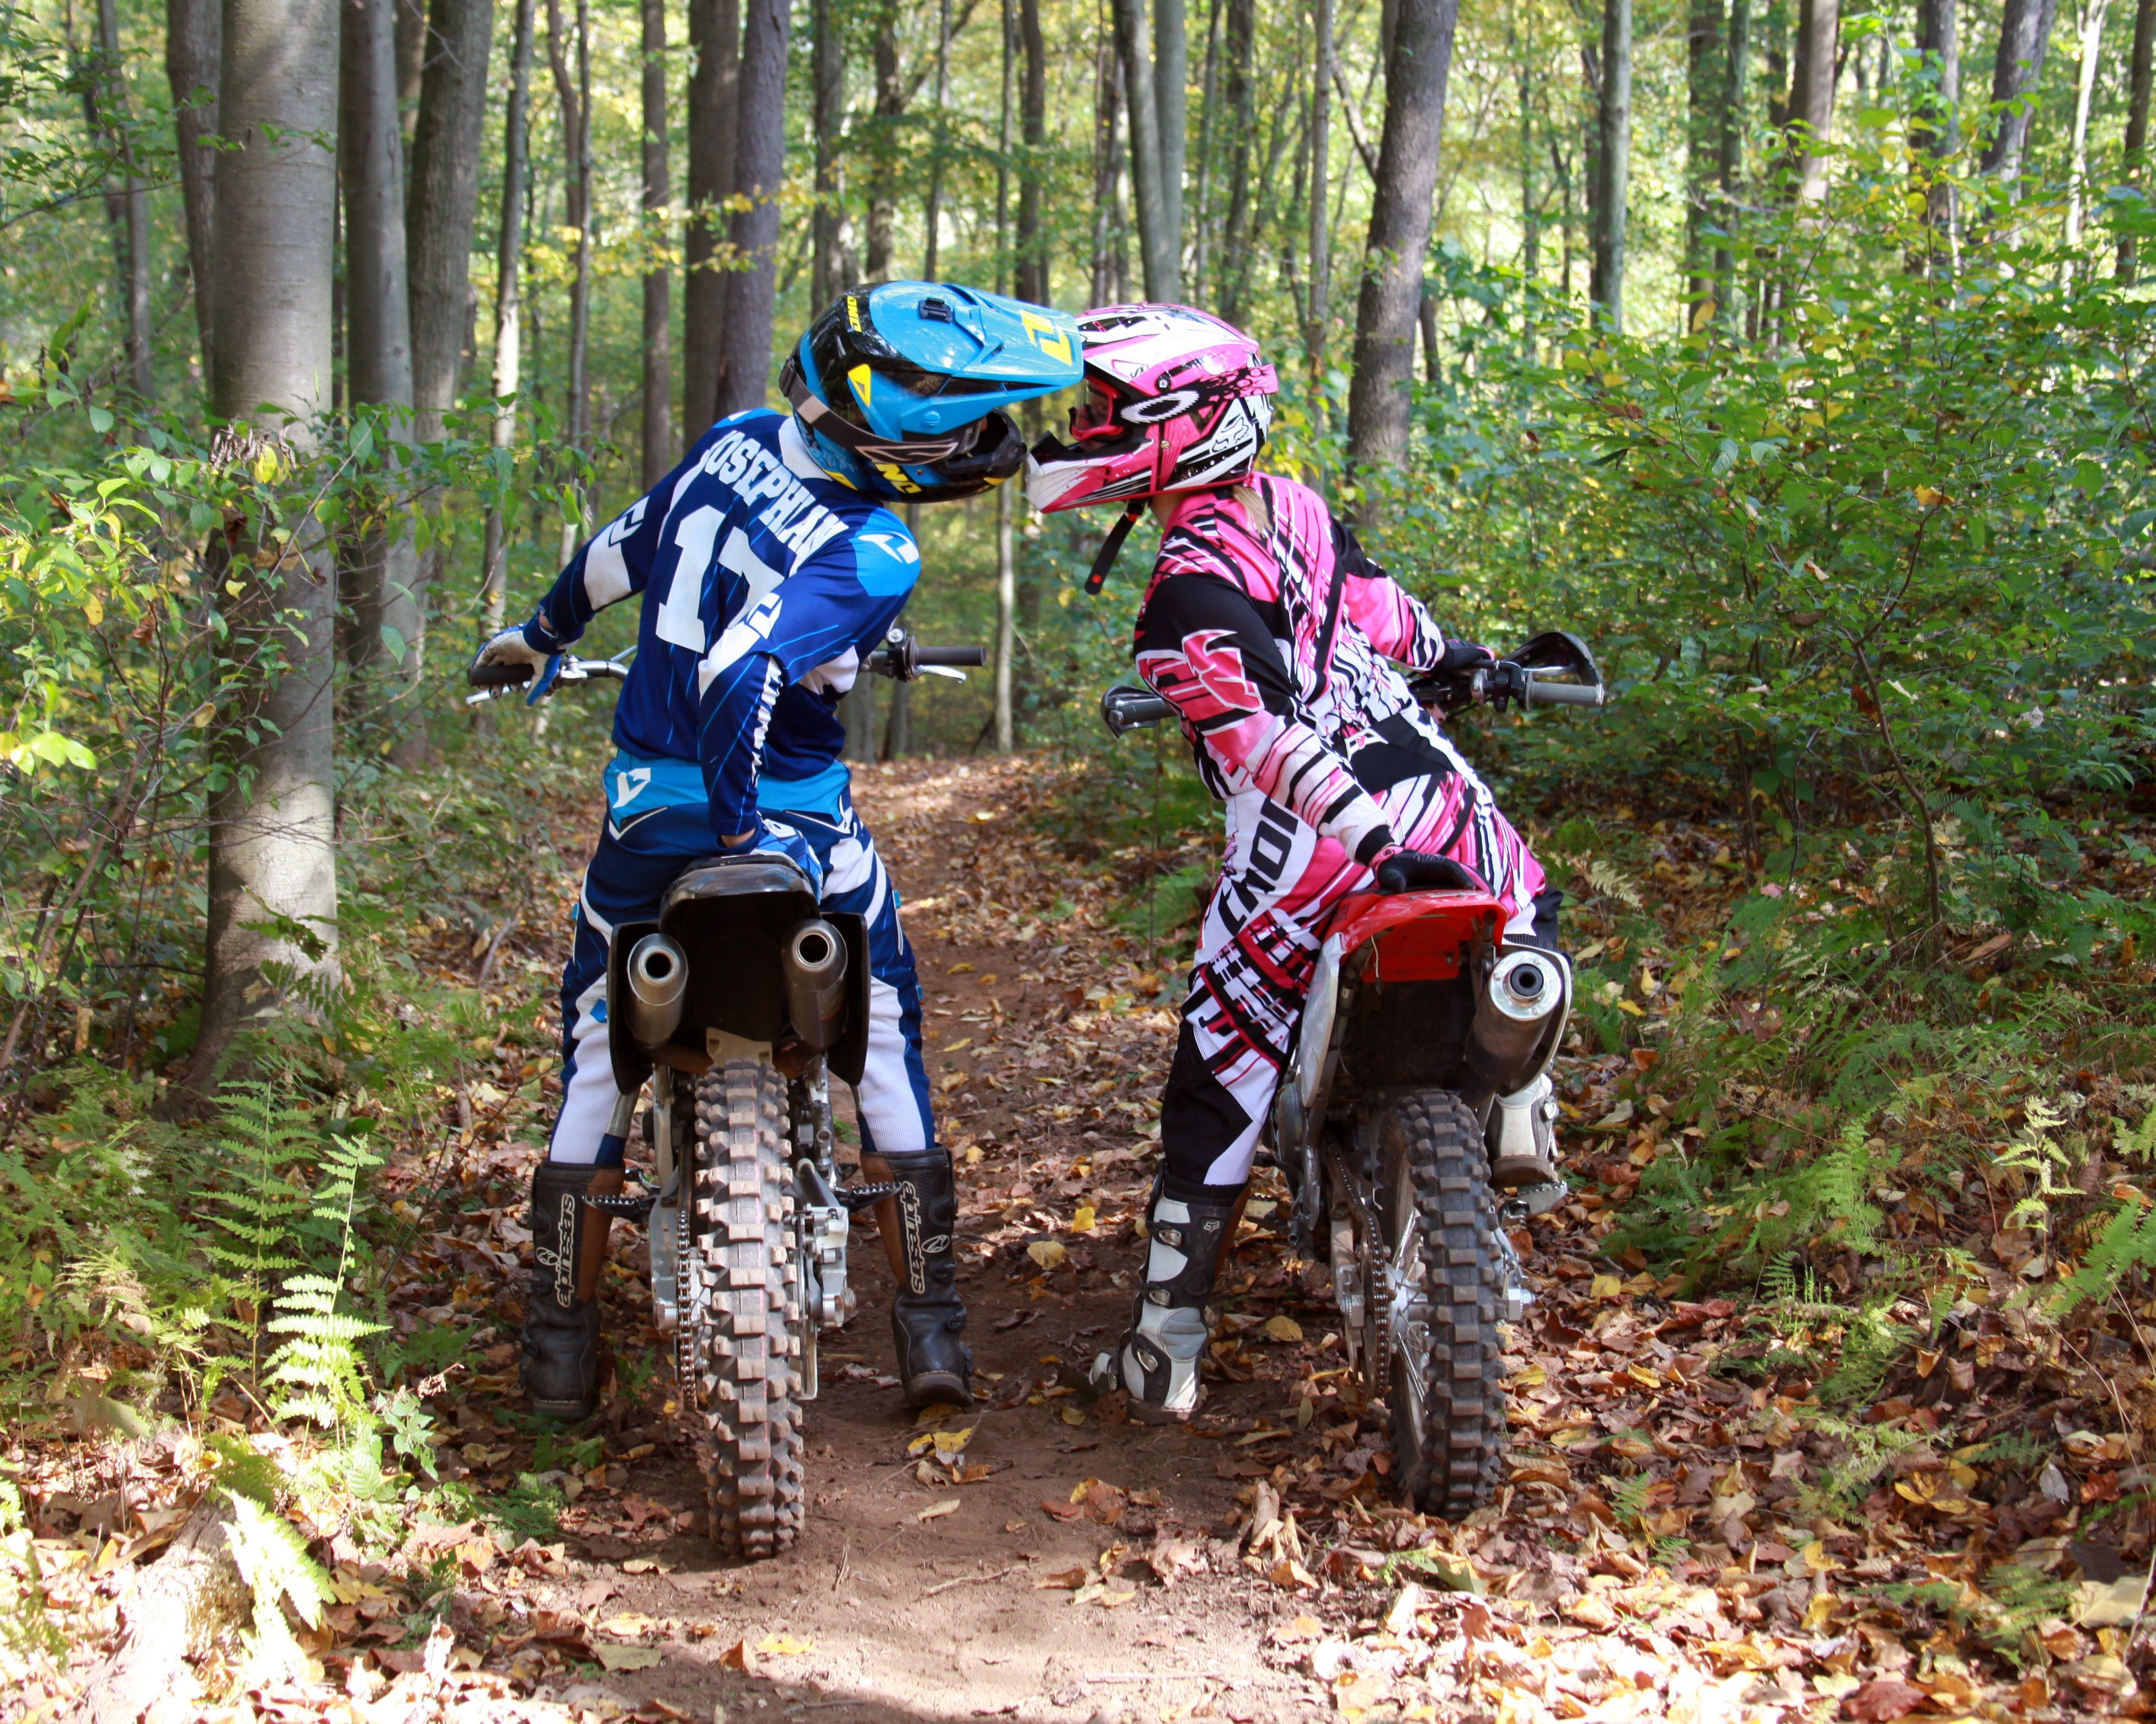 Dating a dirt bike rider